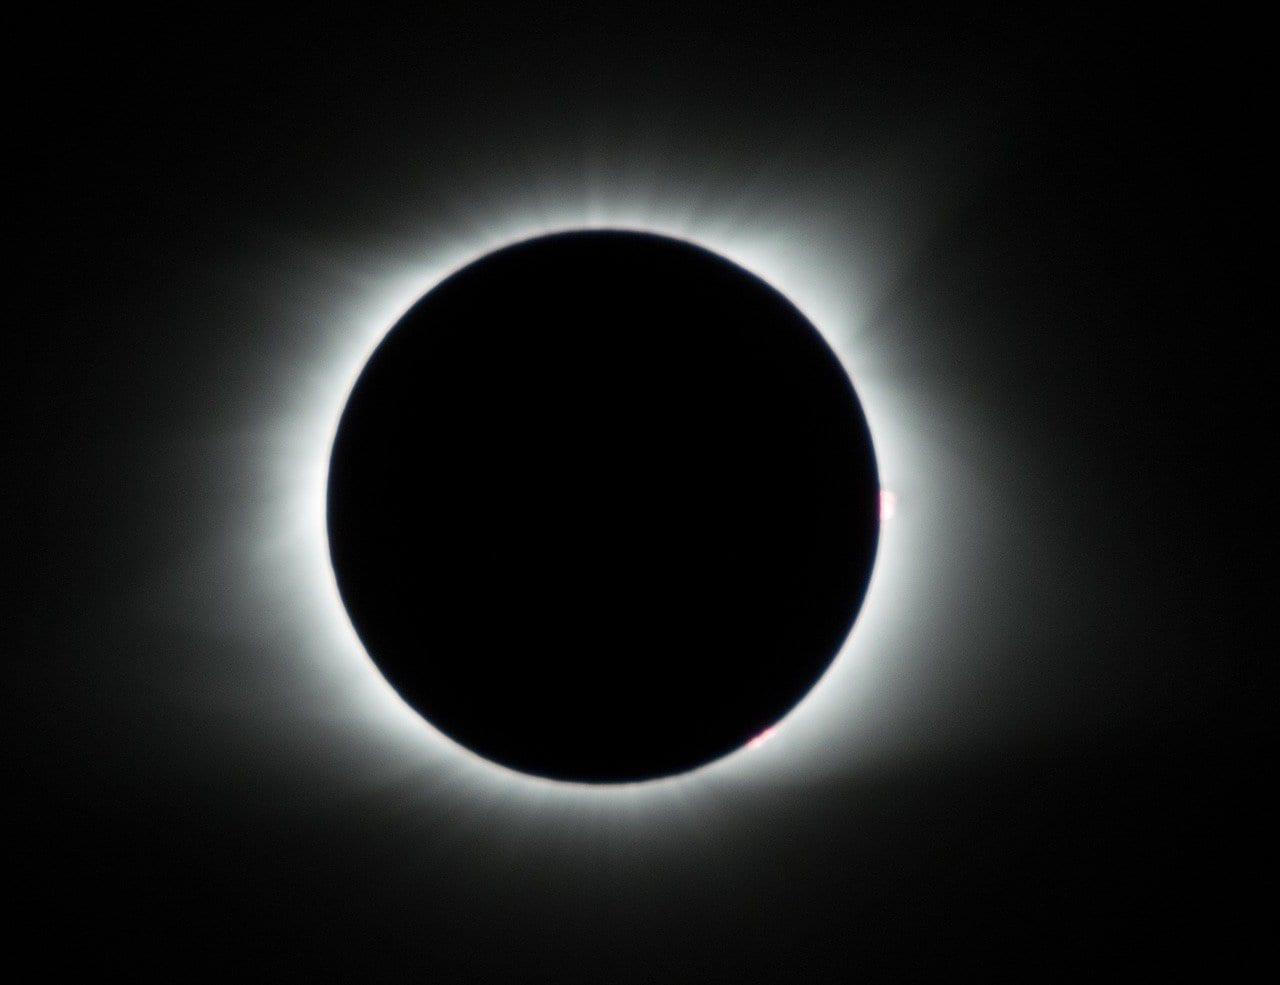 Corona solare